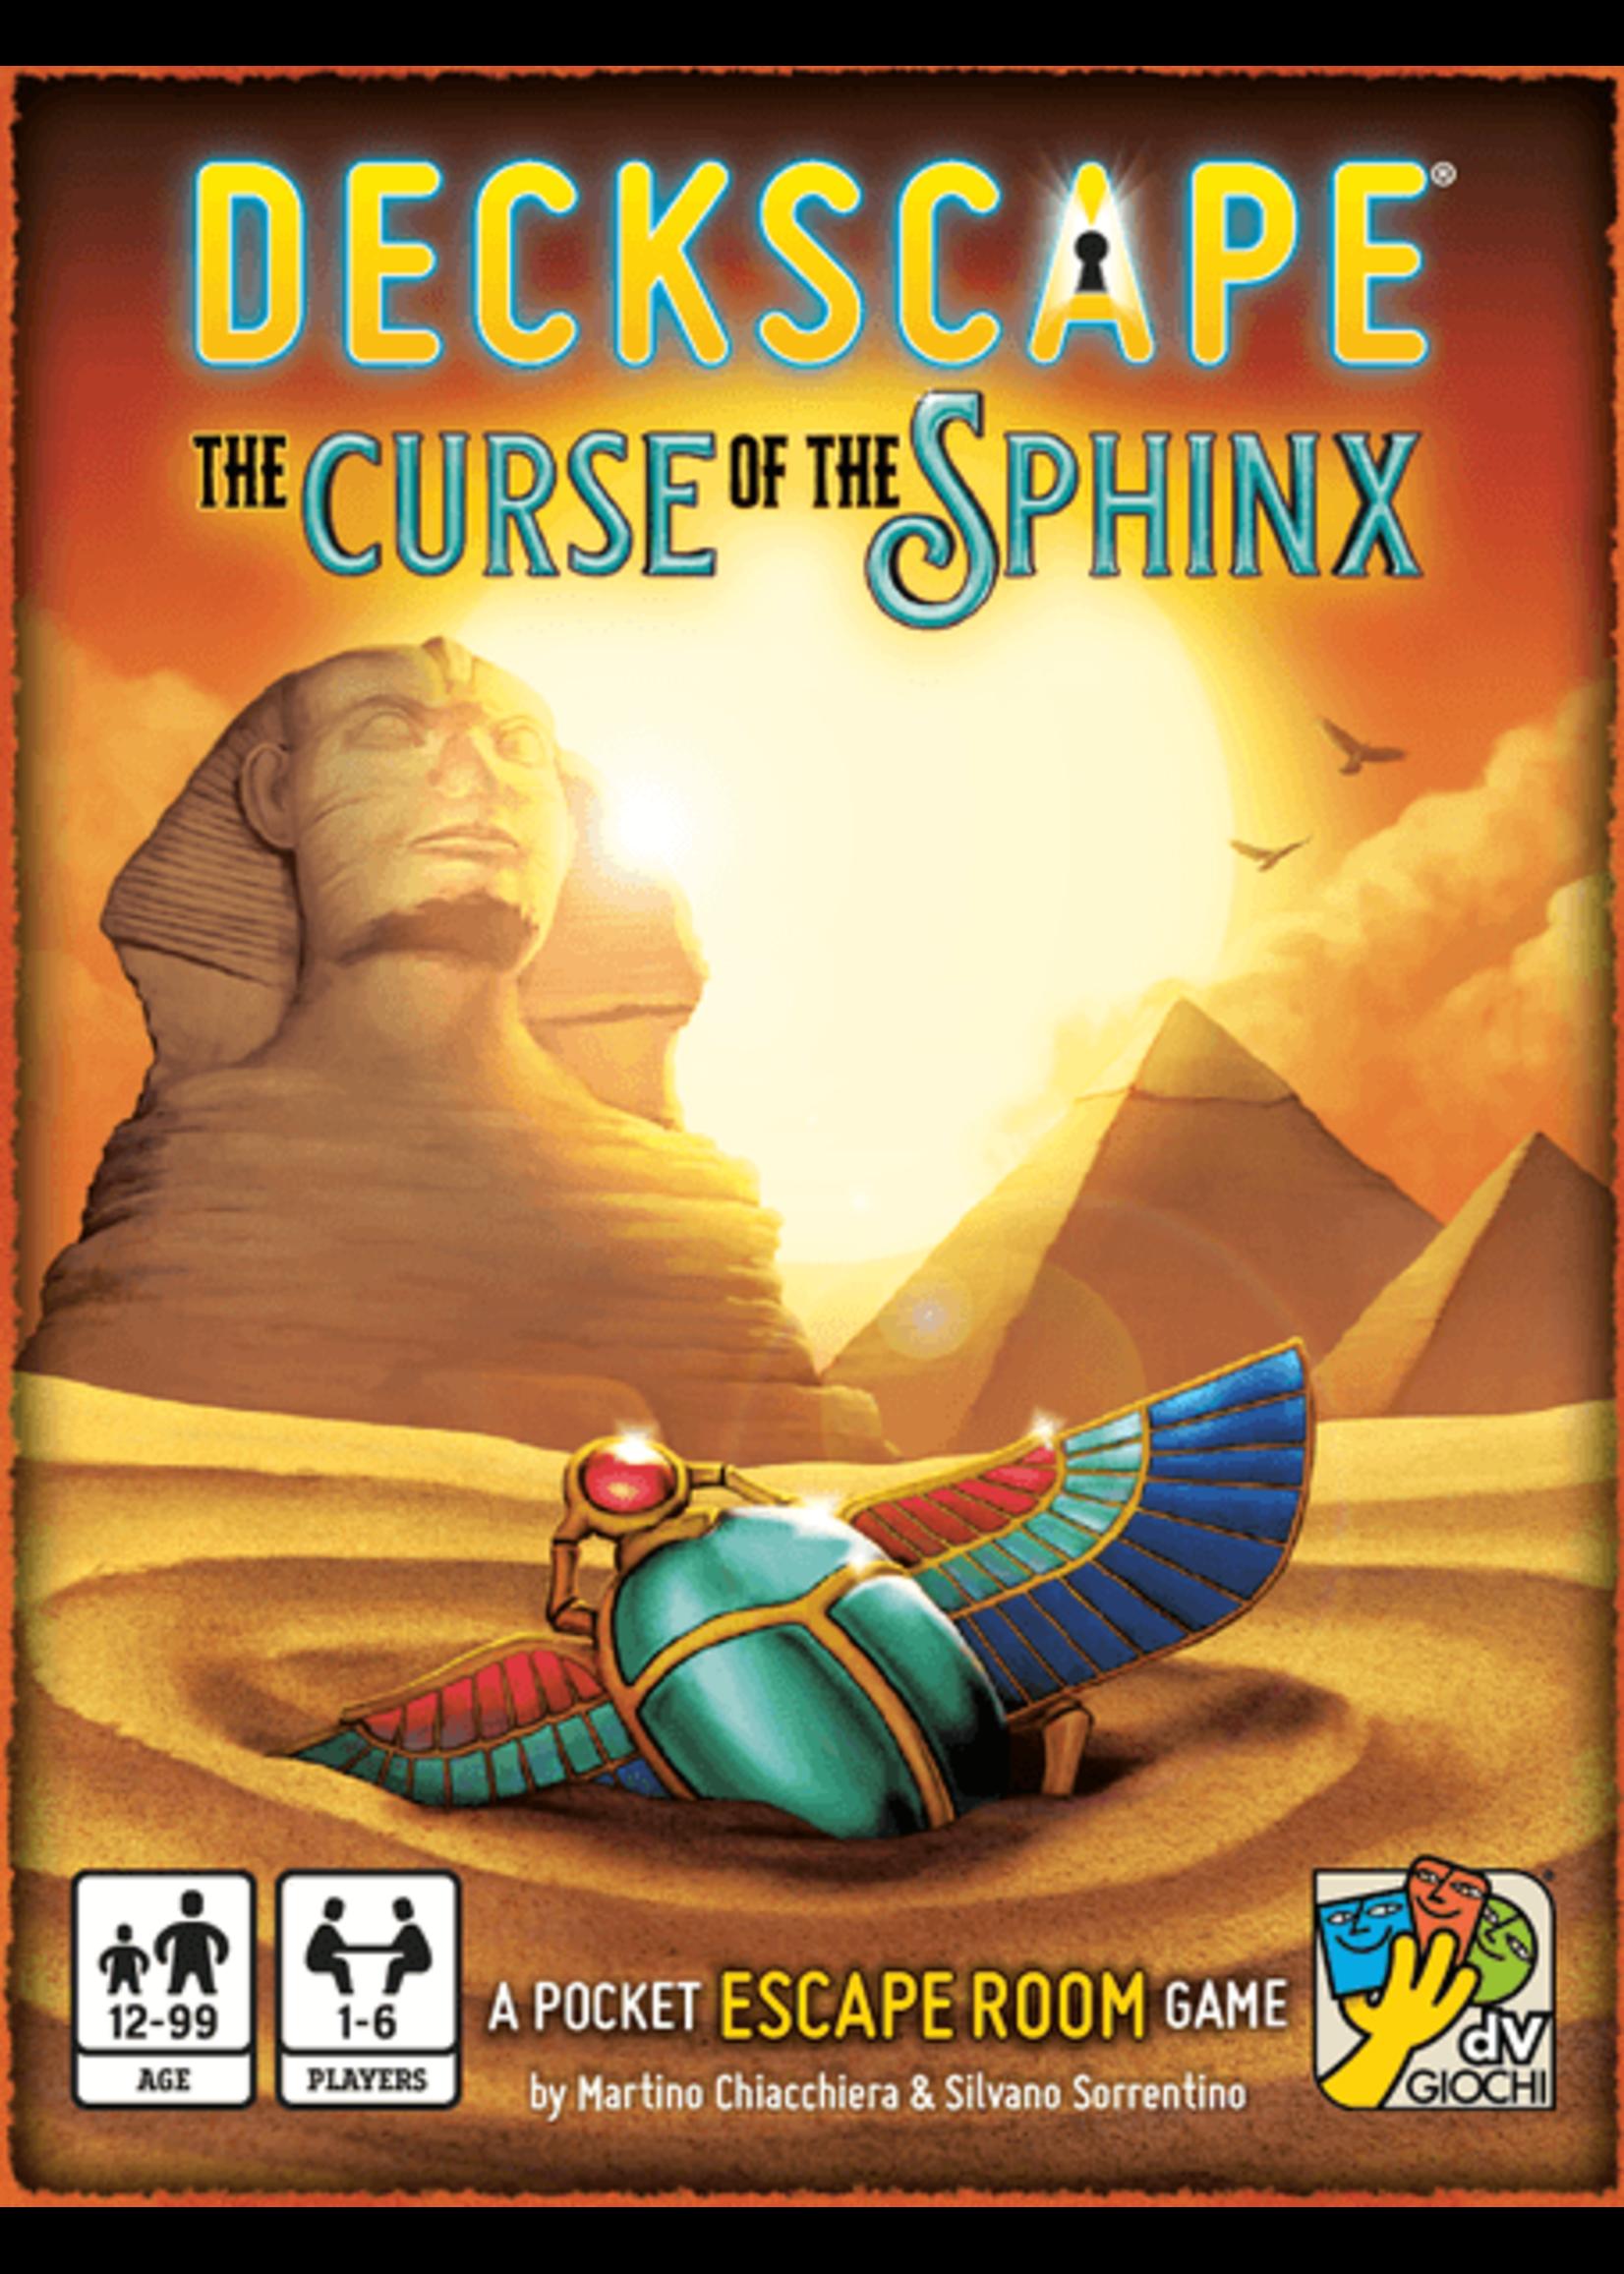 Deckscape: The Curse of the Sphinx